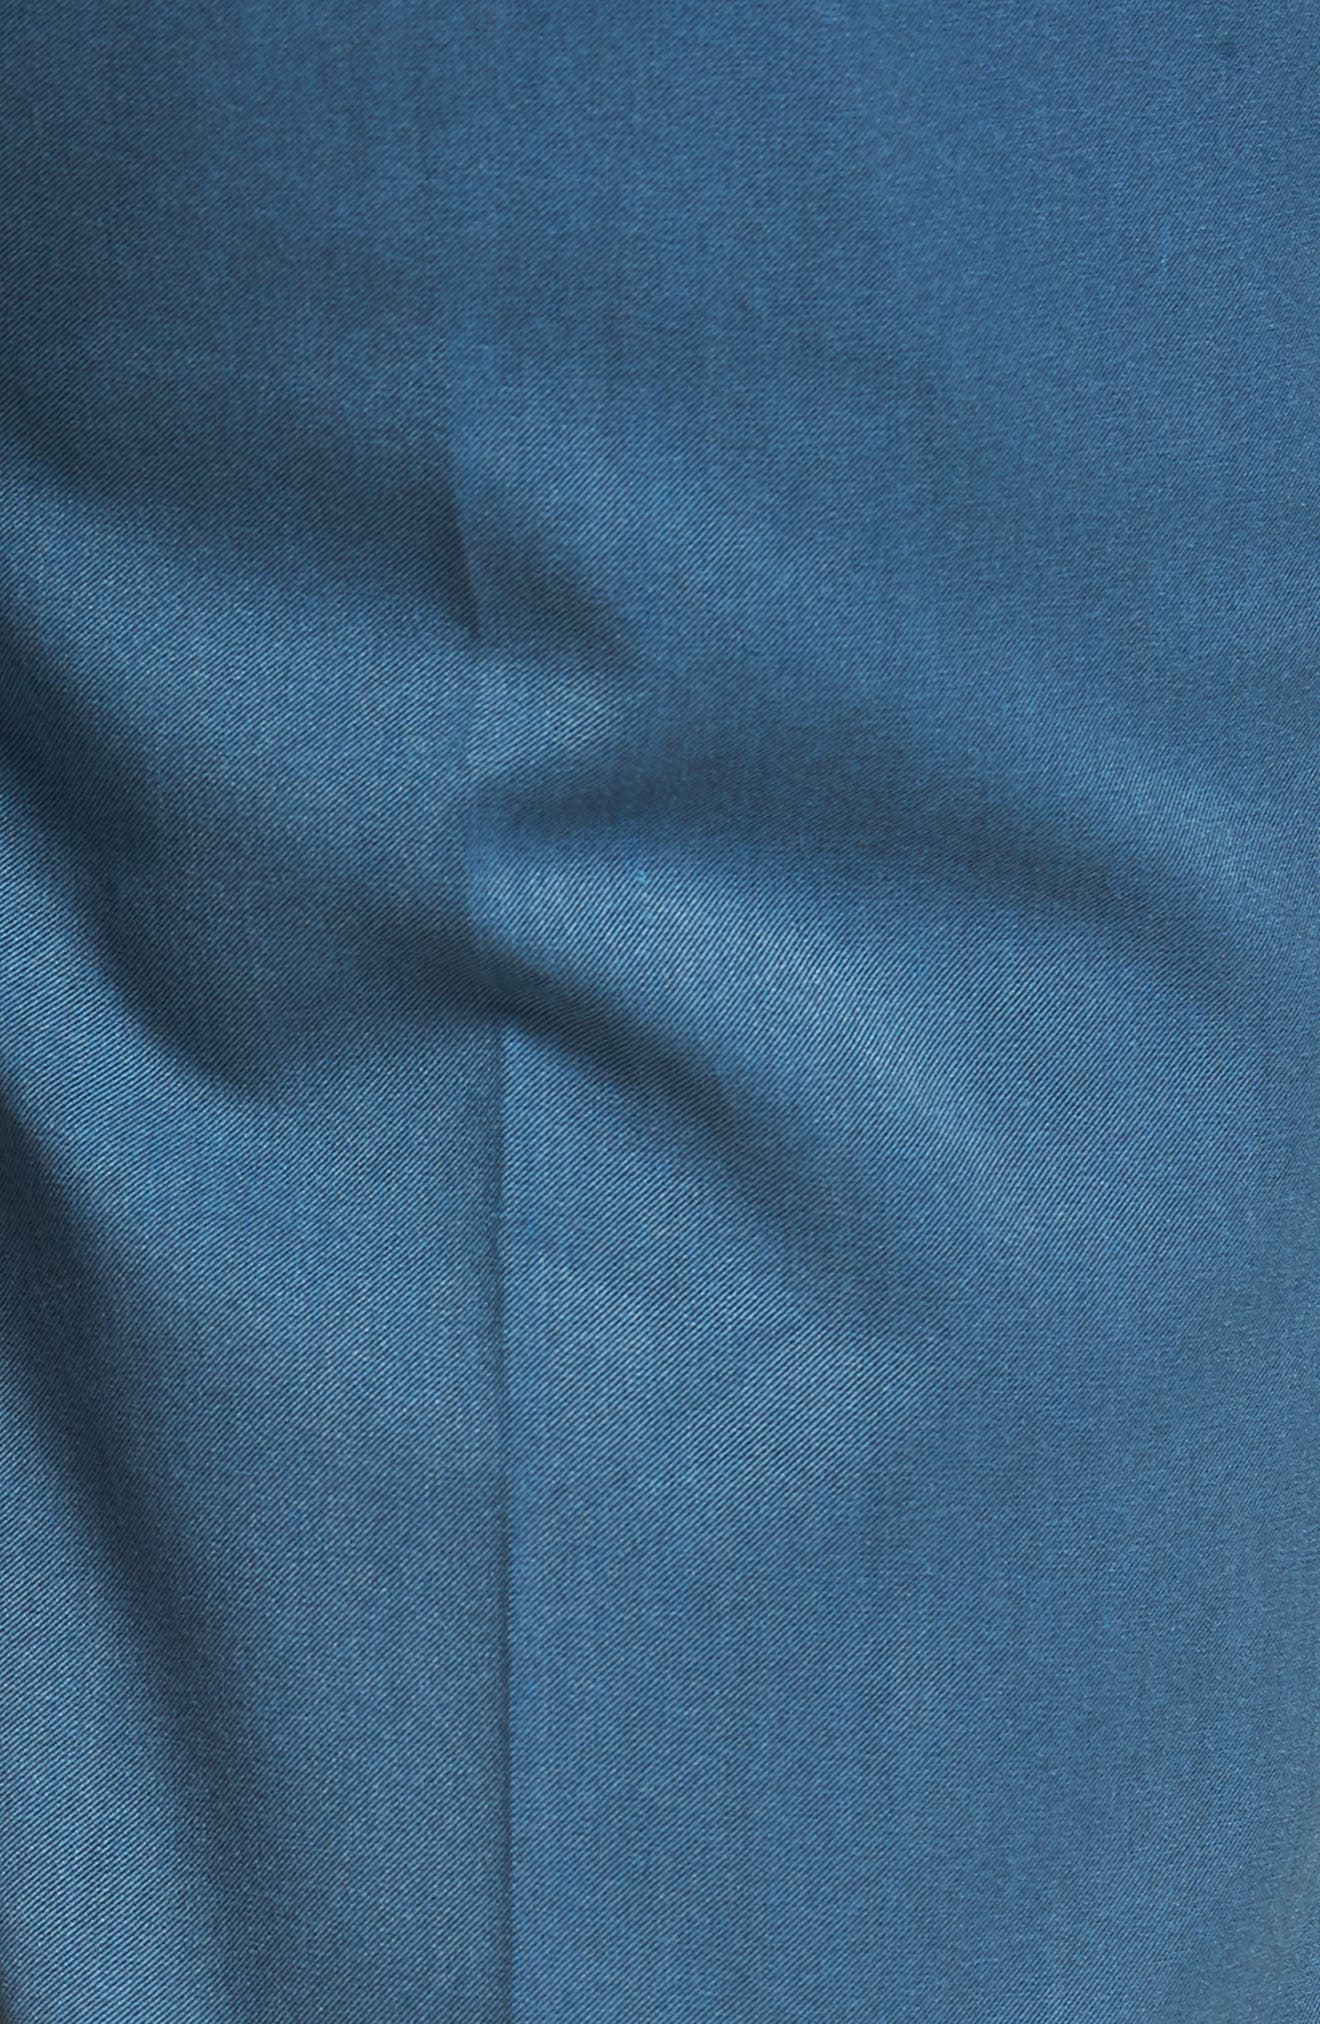 Skinny Fit Suit Trousers,                             Alternate thumbnail 5, color,                             Light Blue